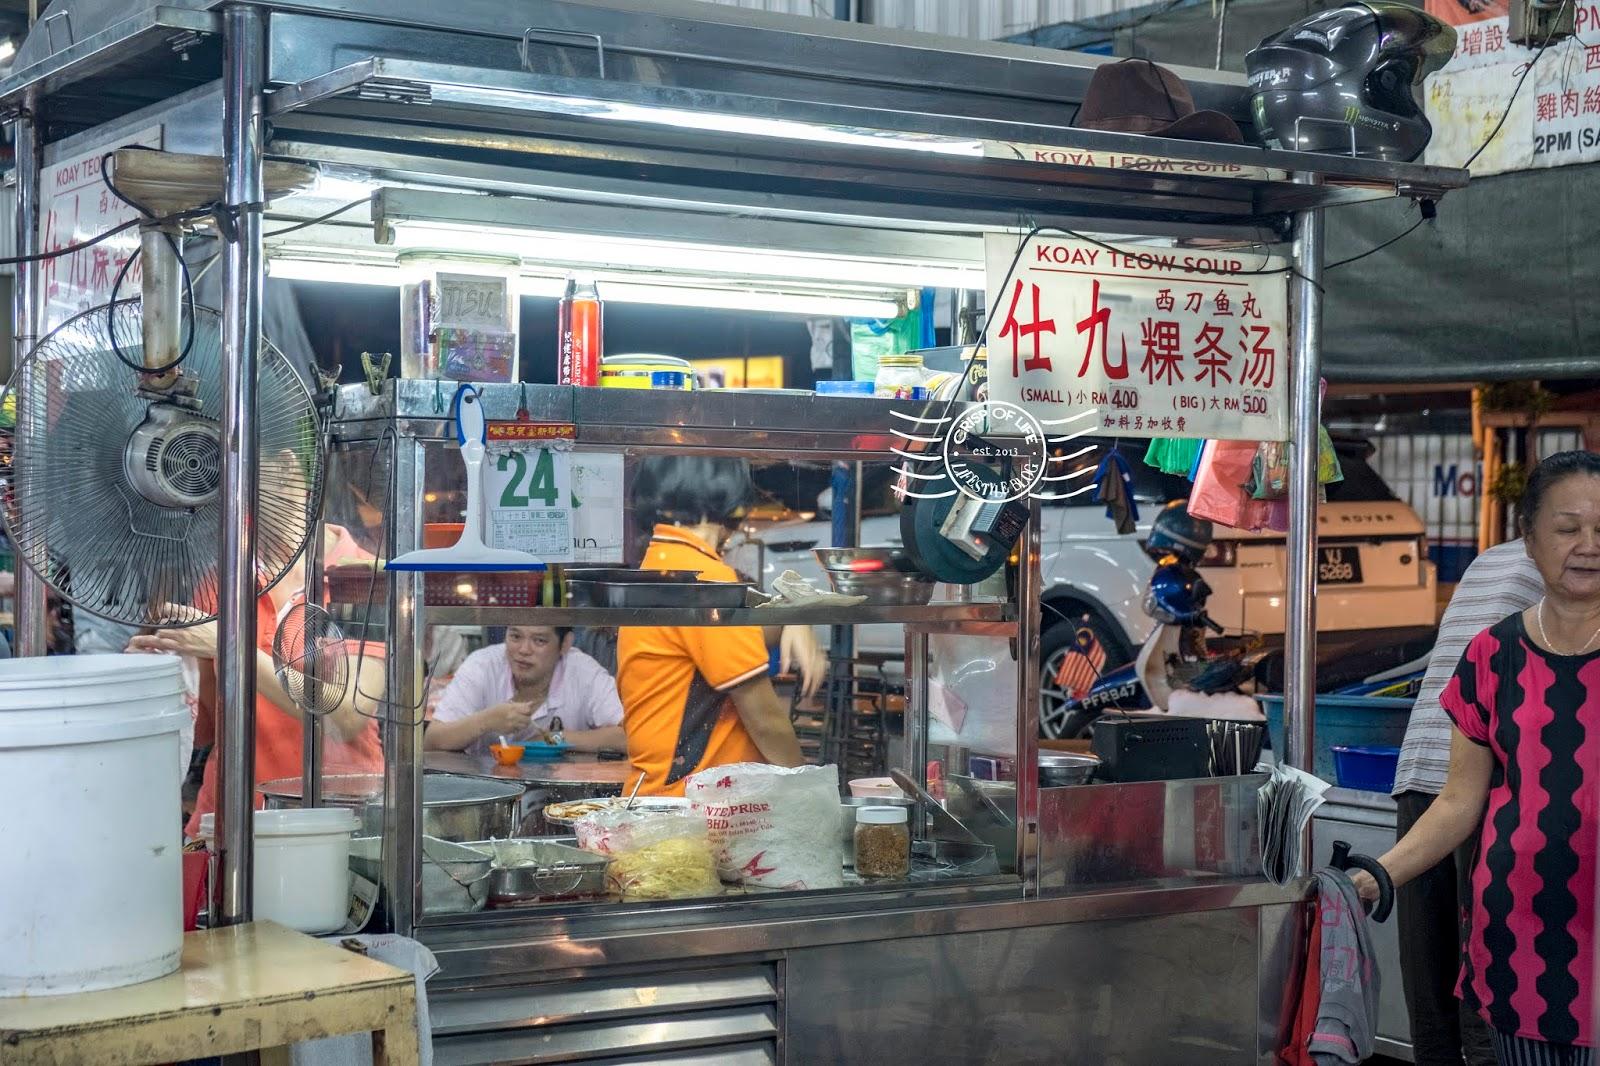 Kompleks Makanan Taman Sin Tatt 信达花园小贩中心 at Raja Uda, Butteroworth, Penang